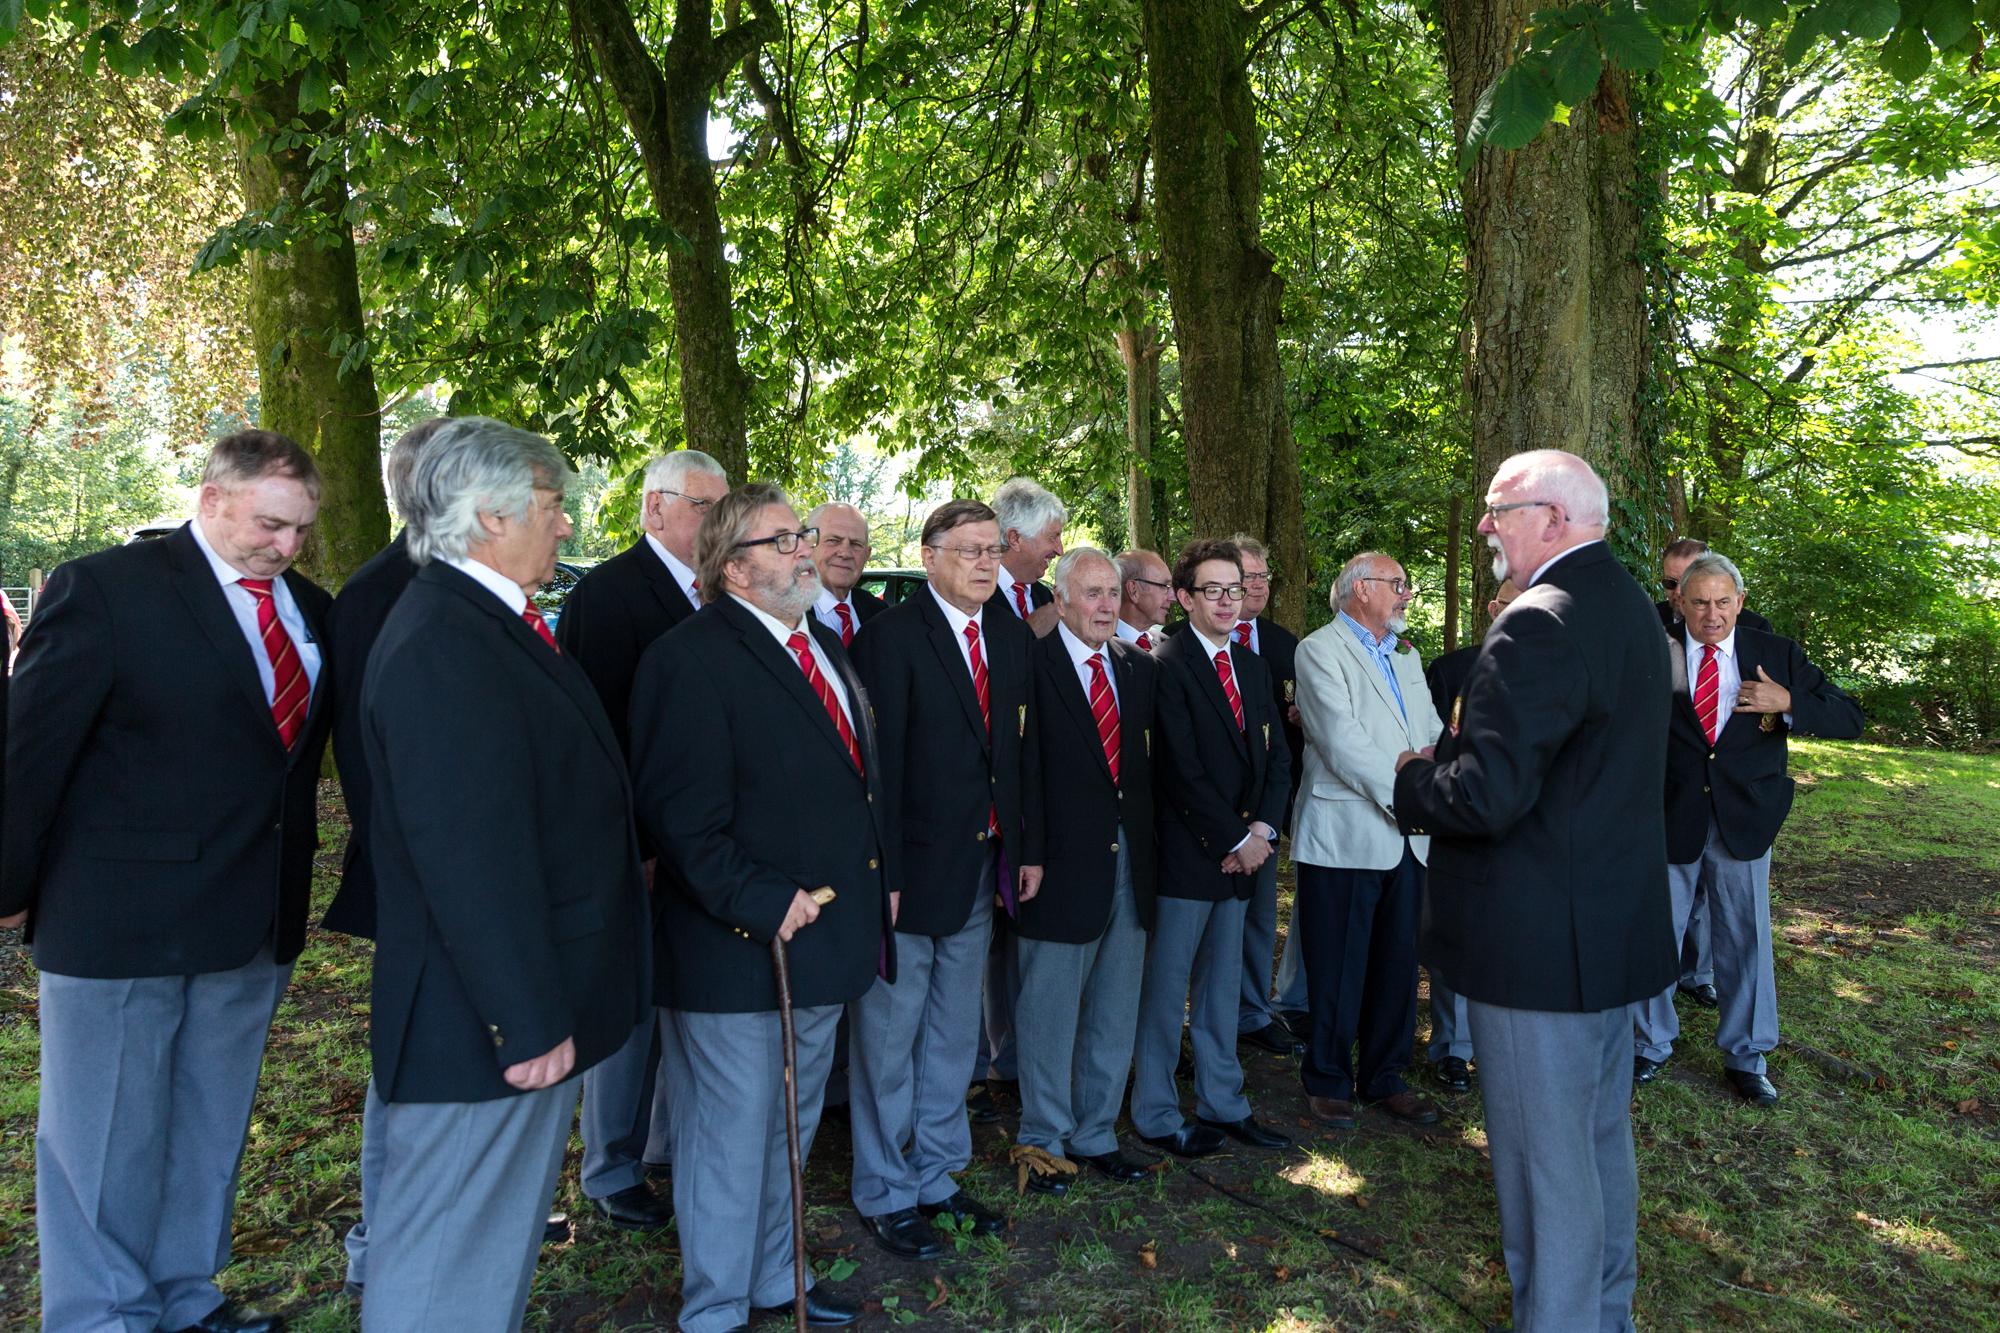 Barges Male Voice choir at llechwen hall wedding